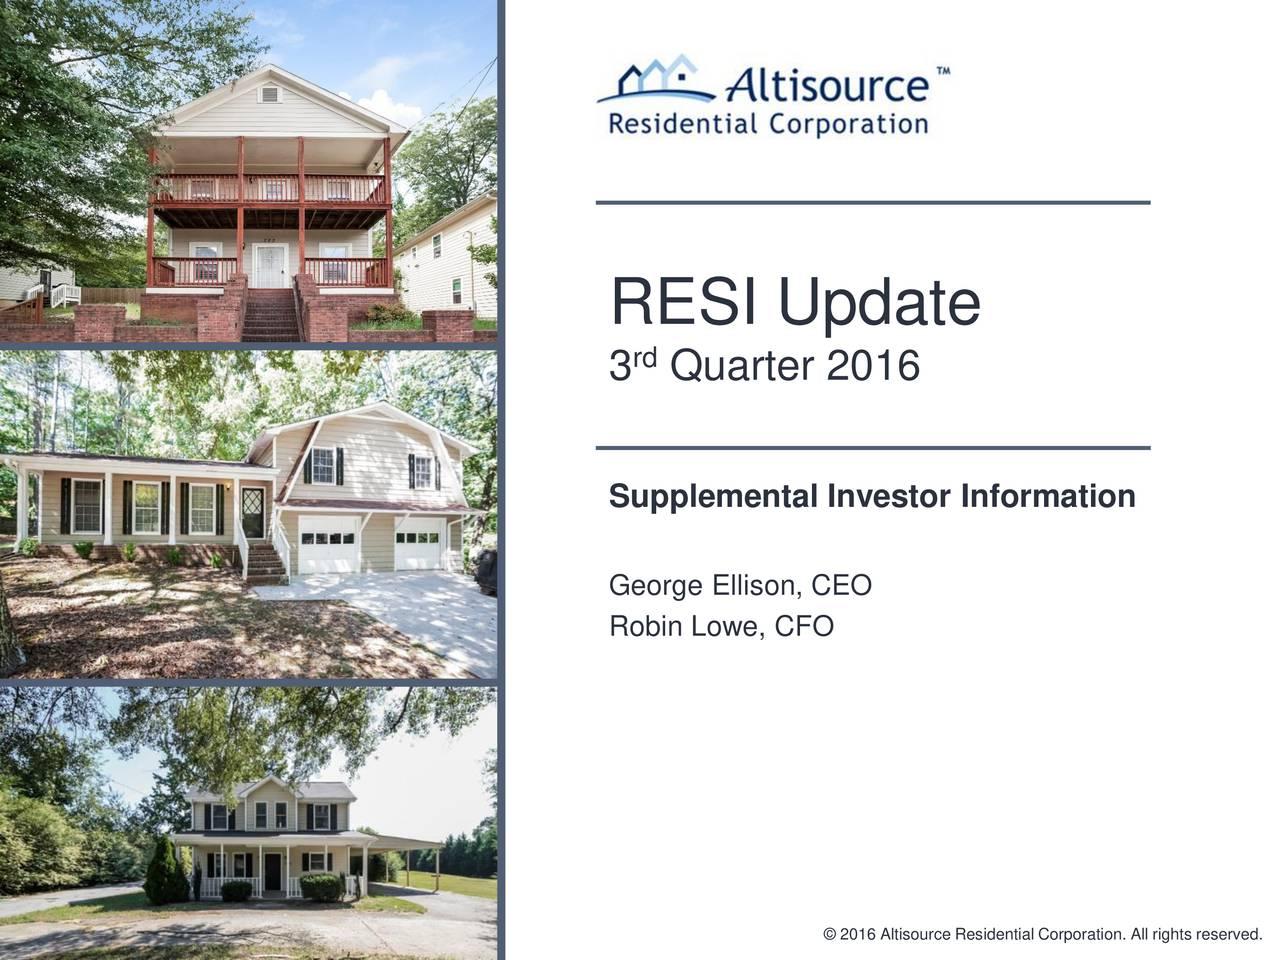 3 Quarter 2016 Supplemental Investor Information George Ellison, CEO Robin Lowe, CFO 2016 Altisource Residential Corporation. All rights reserved.